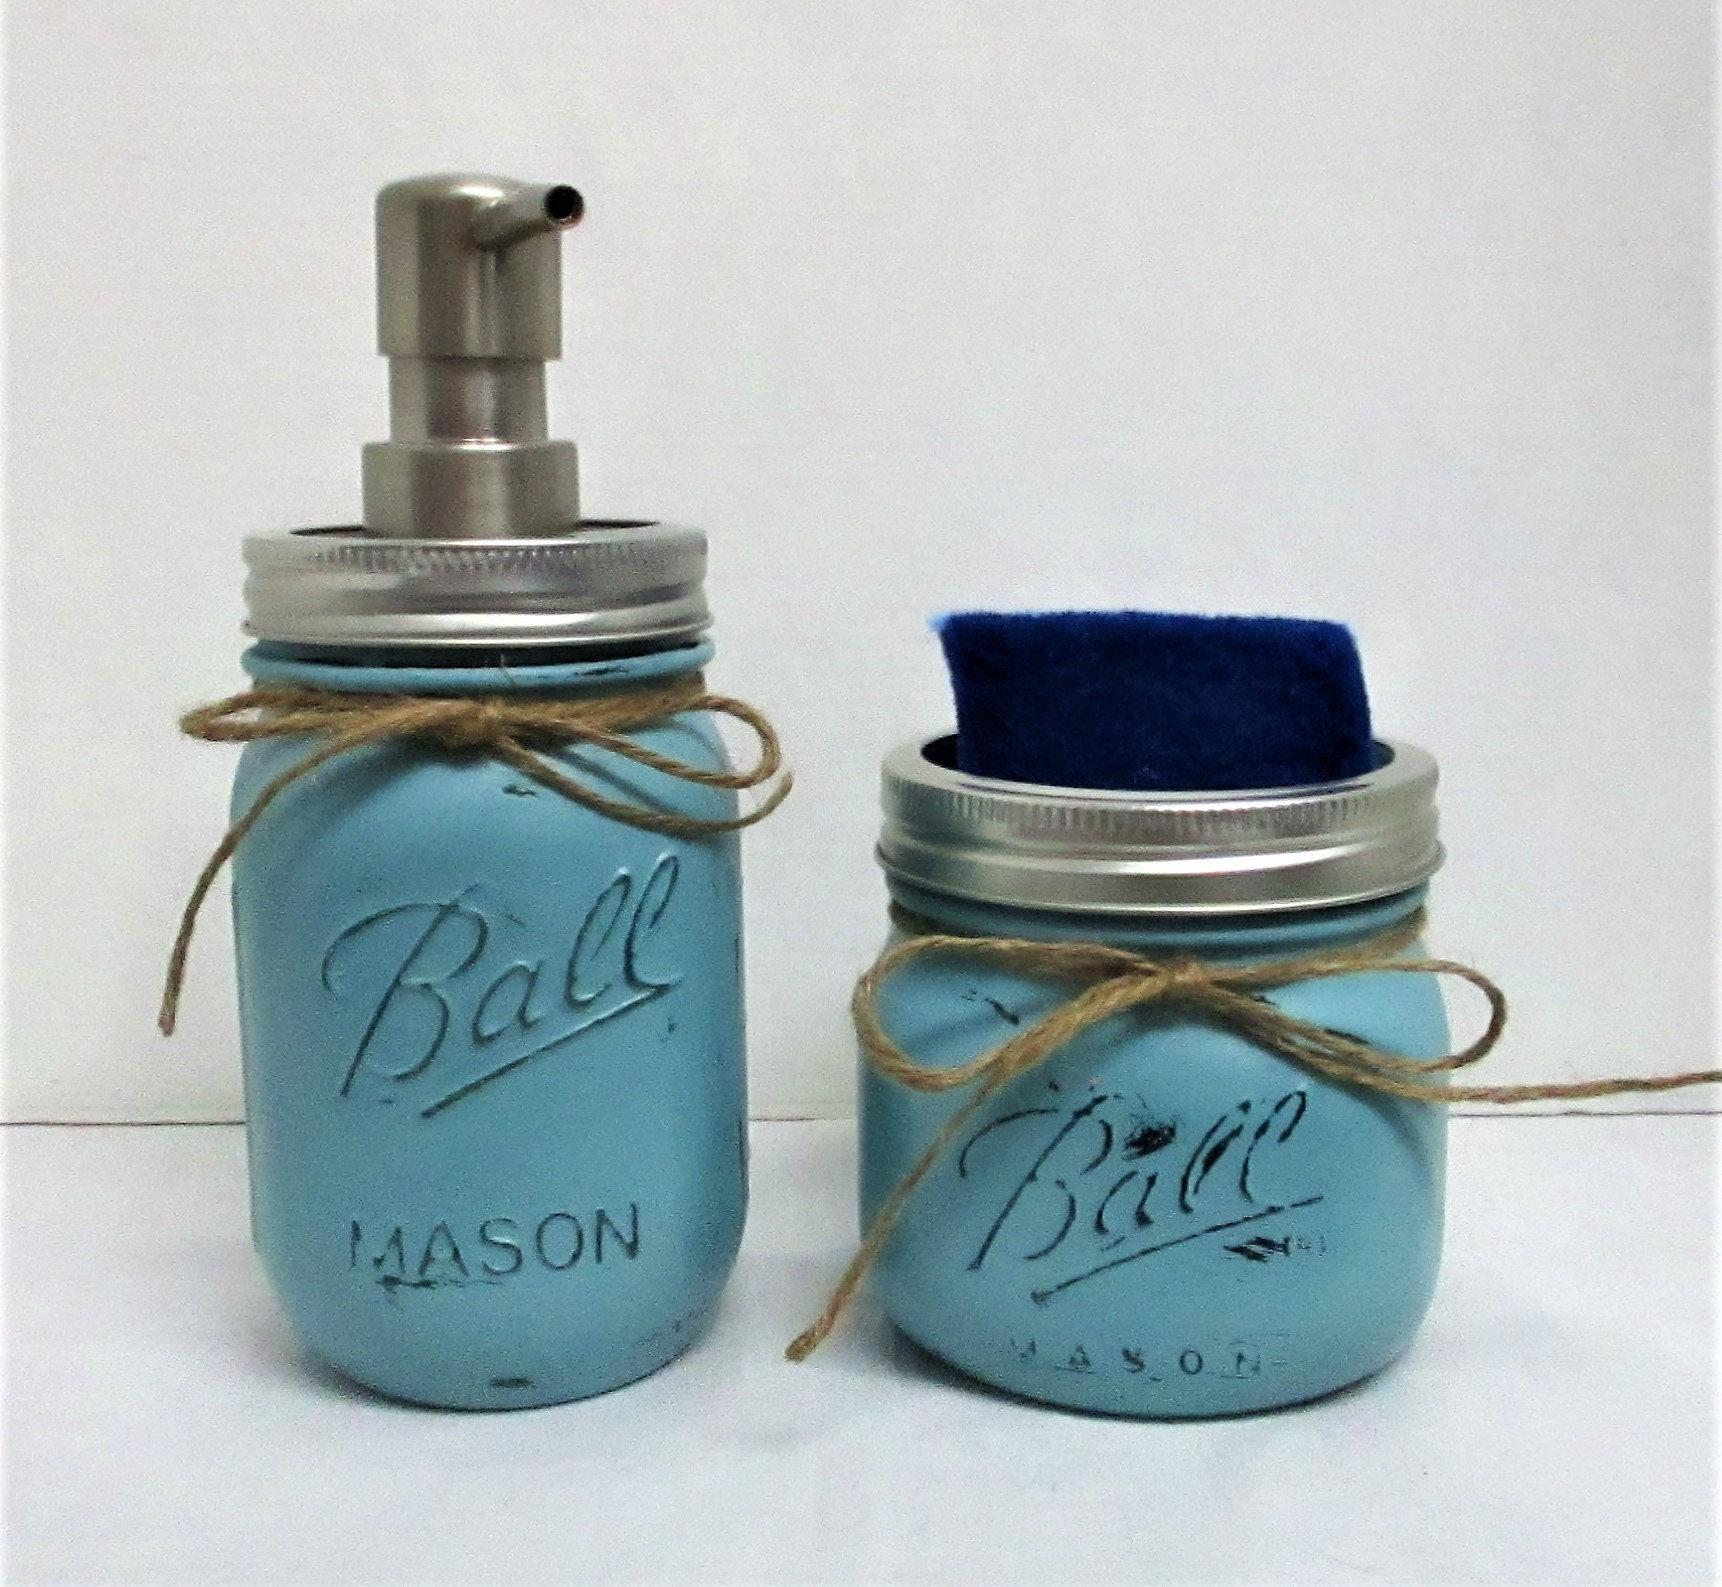 Mason Jar Kitchen Set / Soap Dispenser / Sponge Holder / Rustic ...